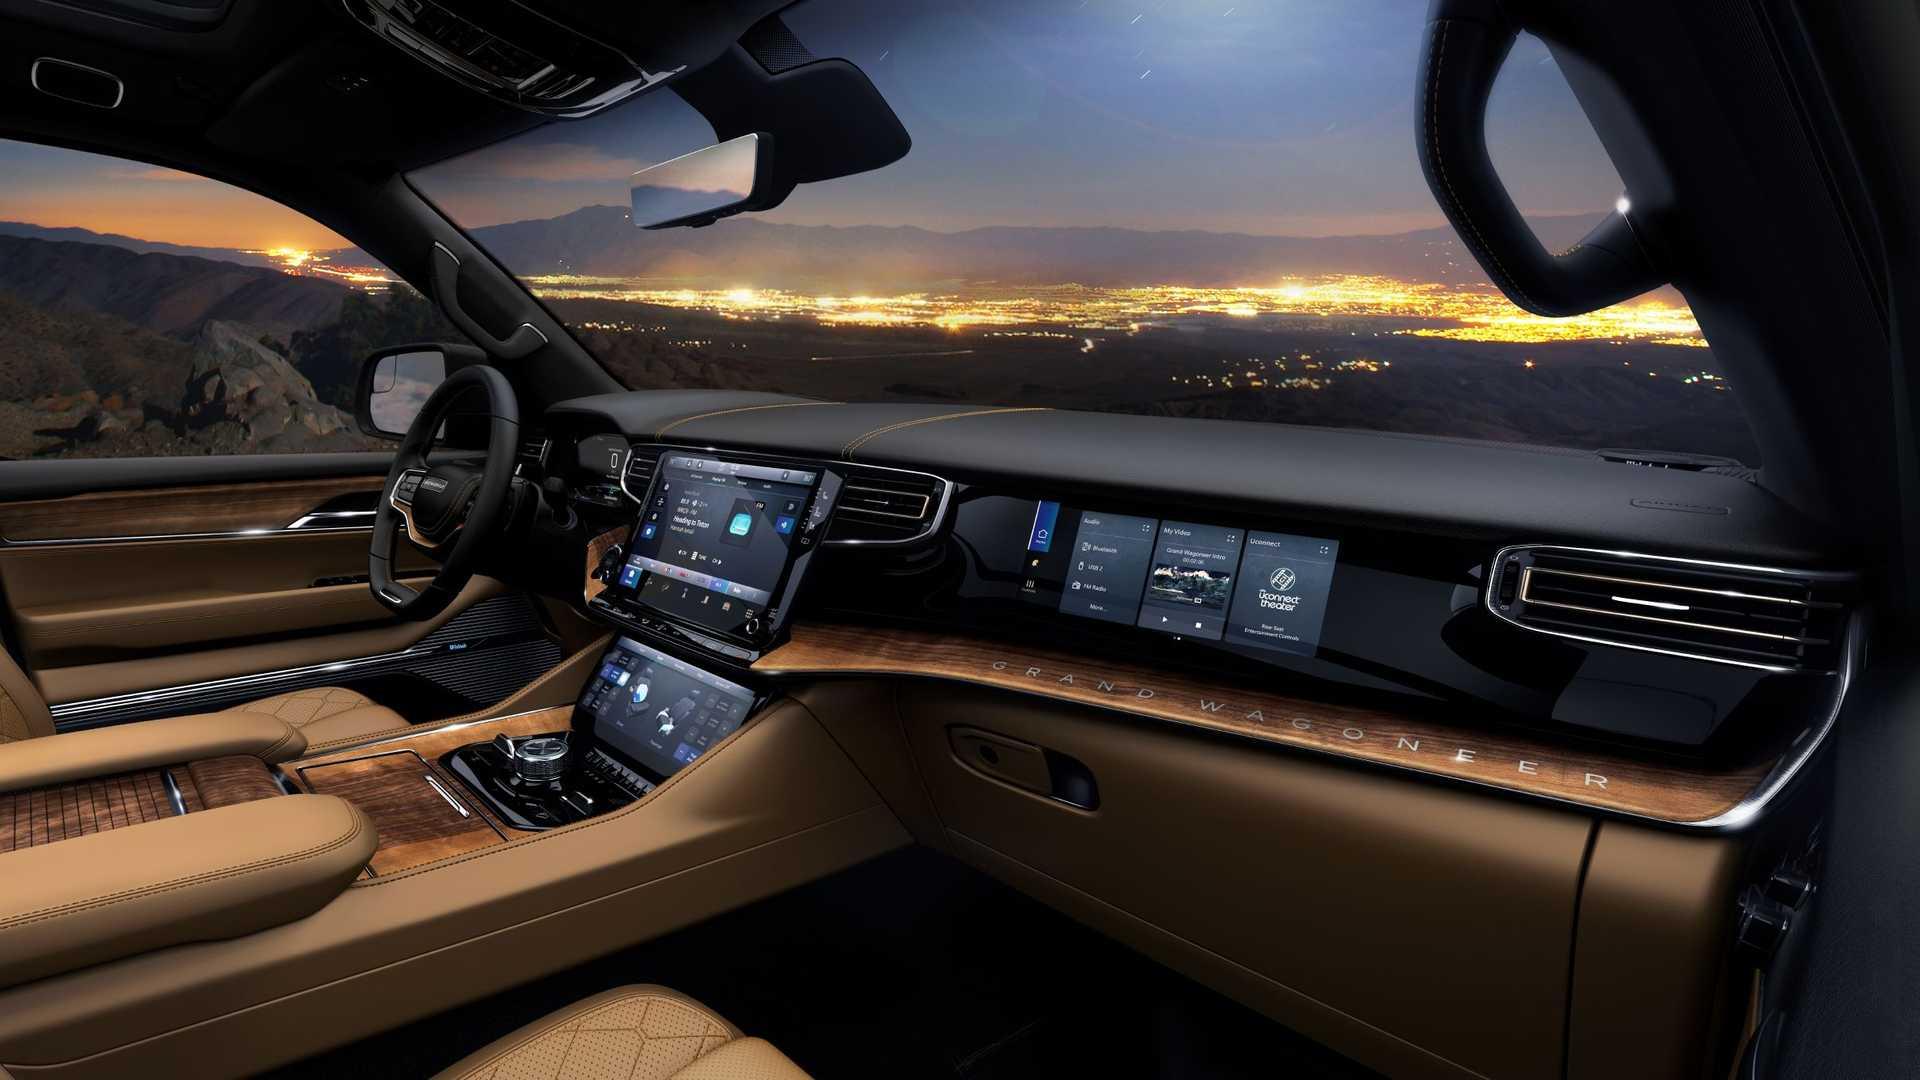 2022-jeep-grand-wagoneer-interior-dashboard-1